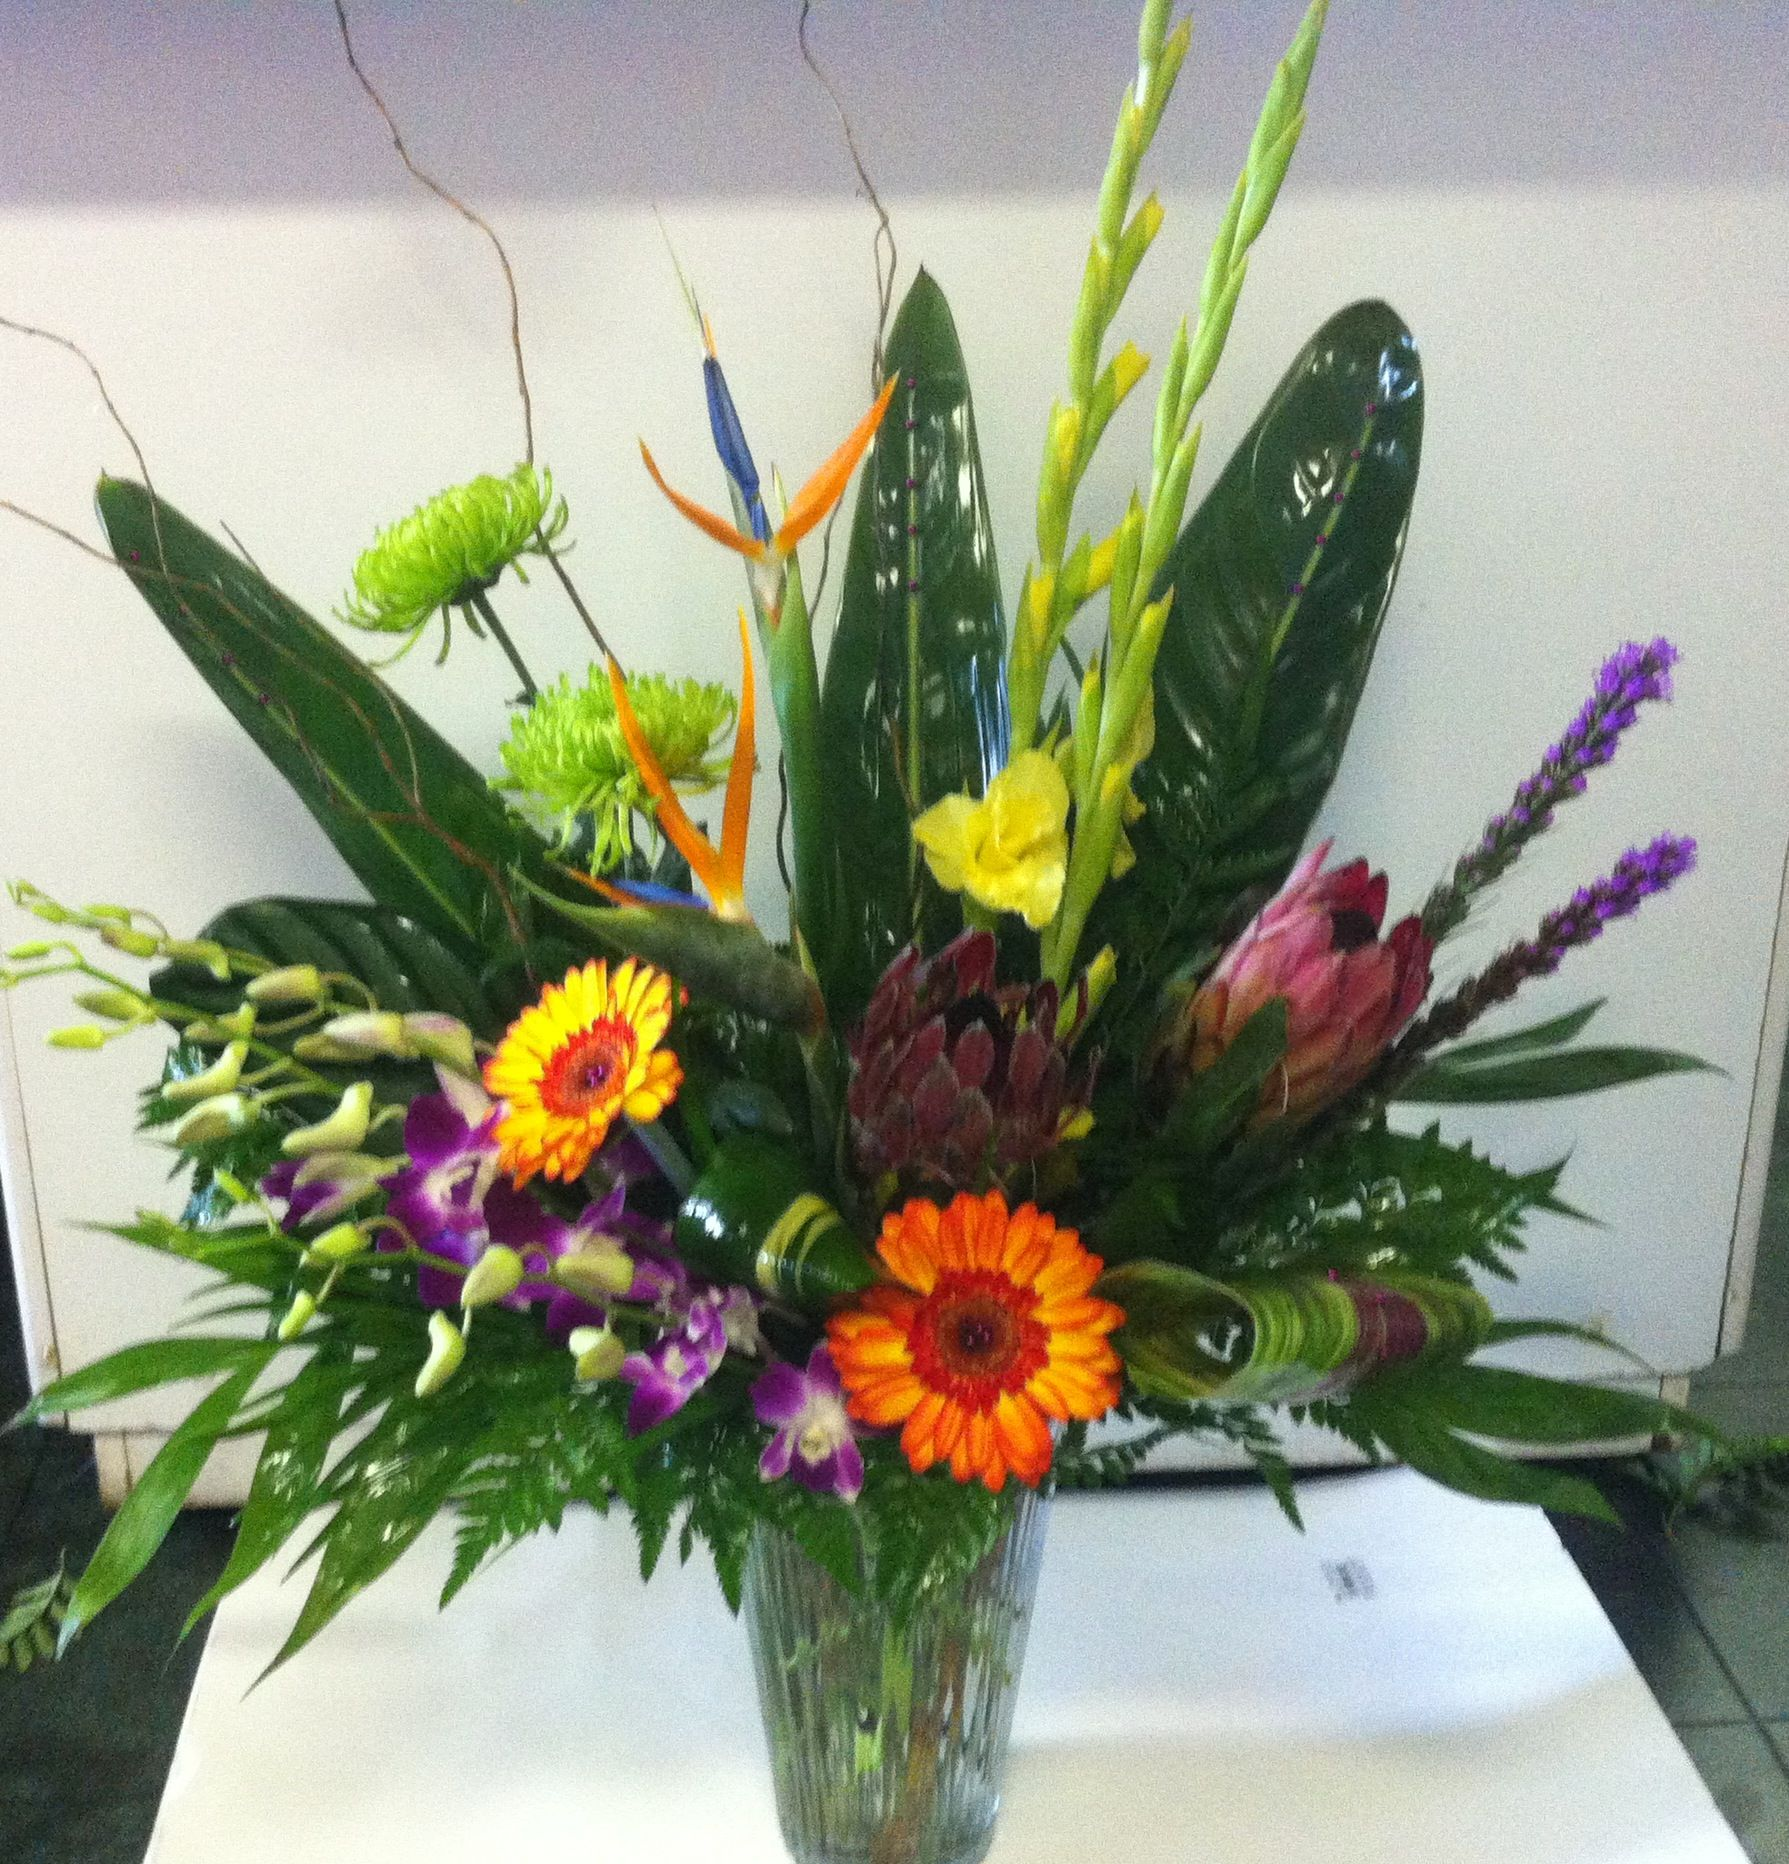 flower delivery virginia beach 23464